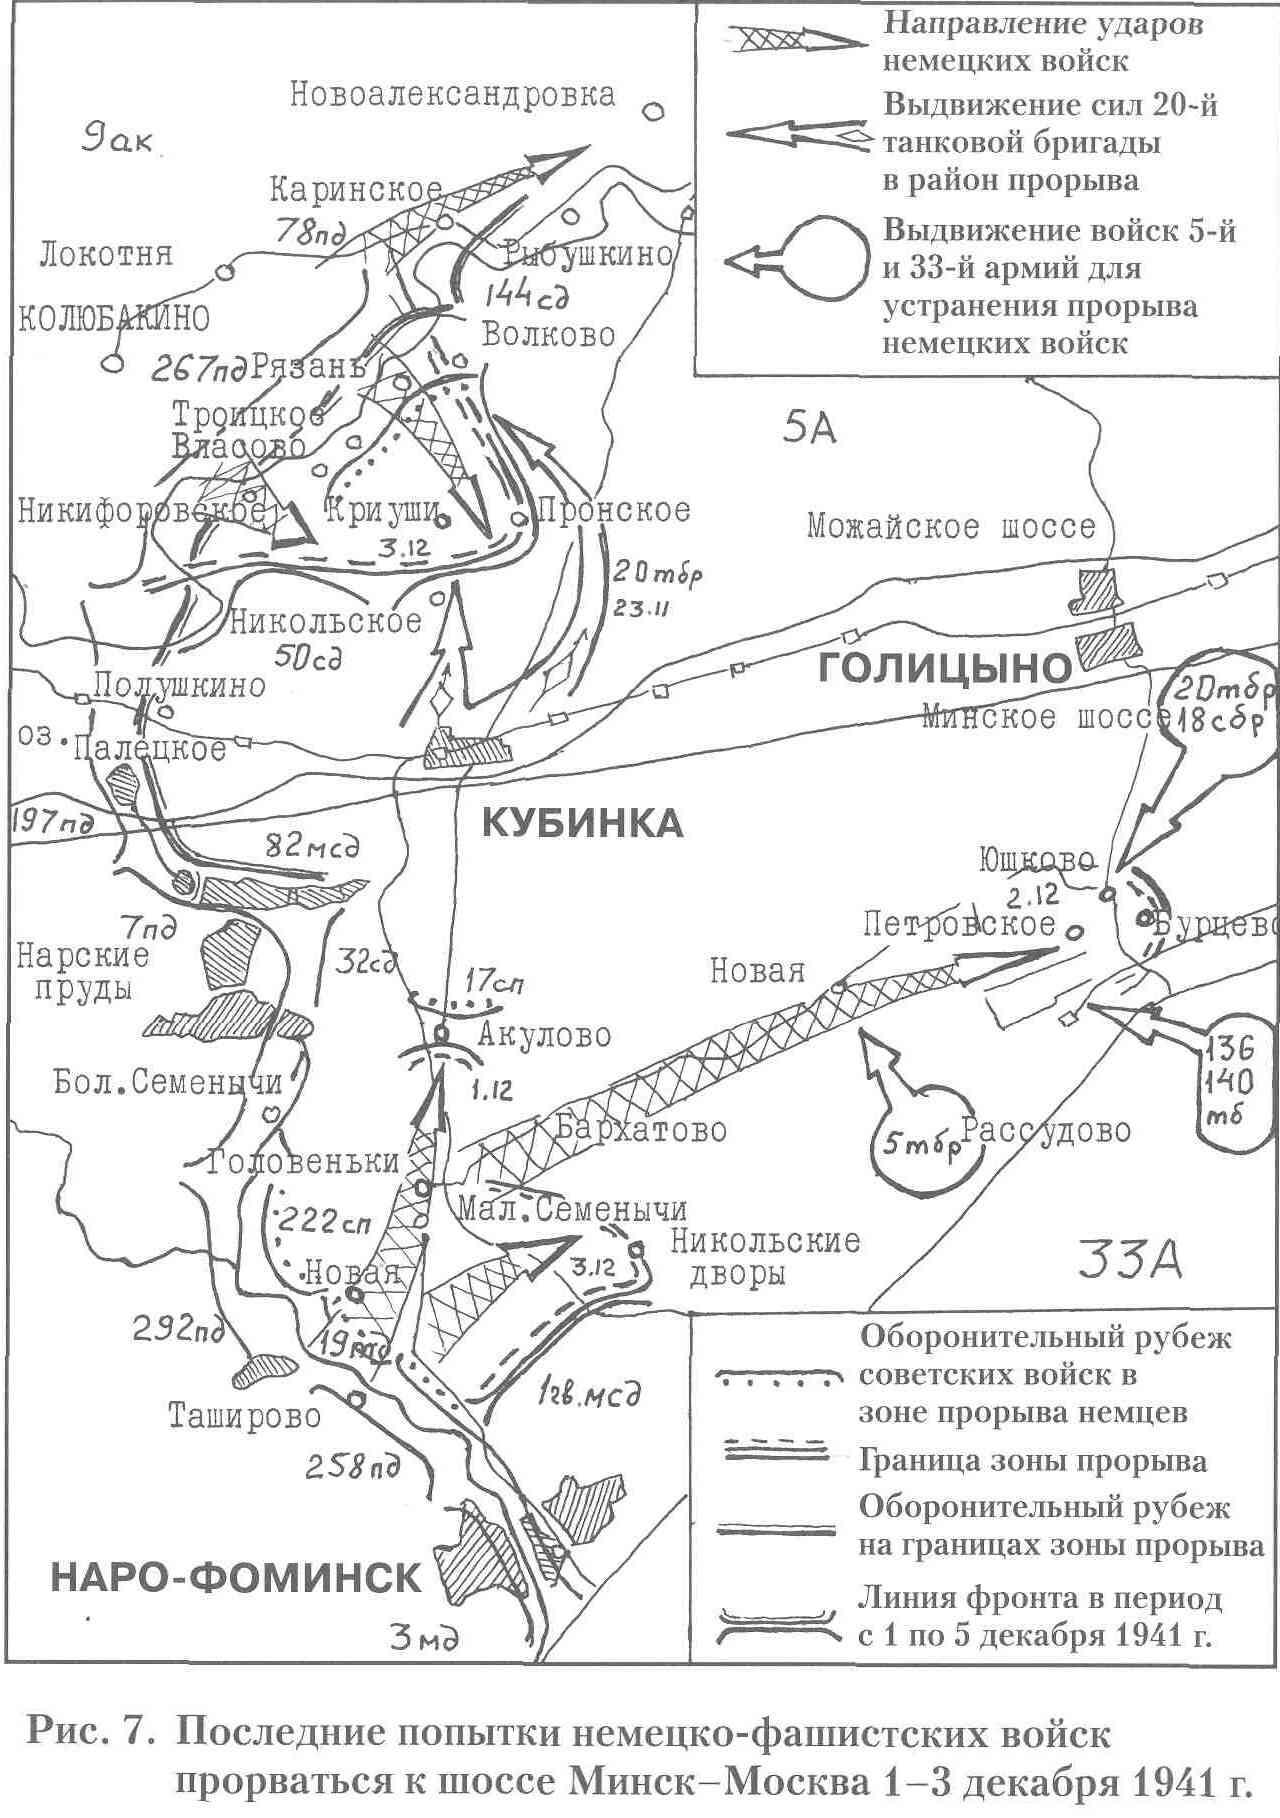 Baranovskiy_07_Moscow_Dec01_03_41.jpg